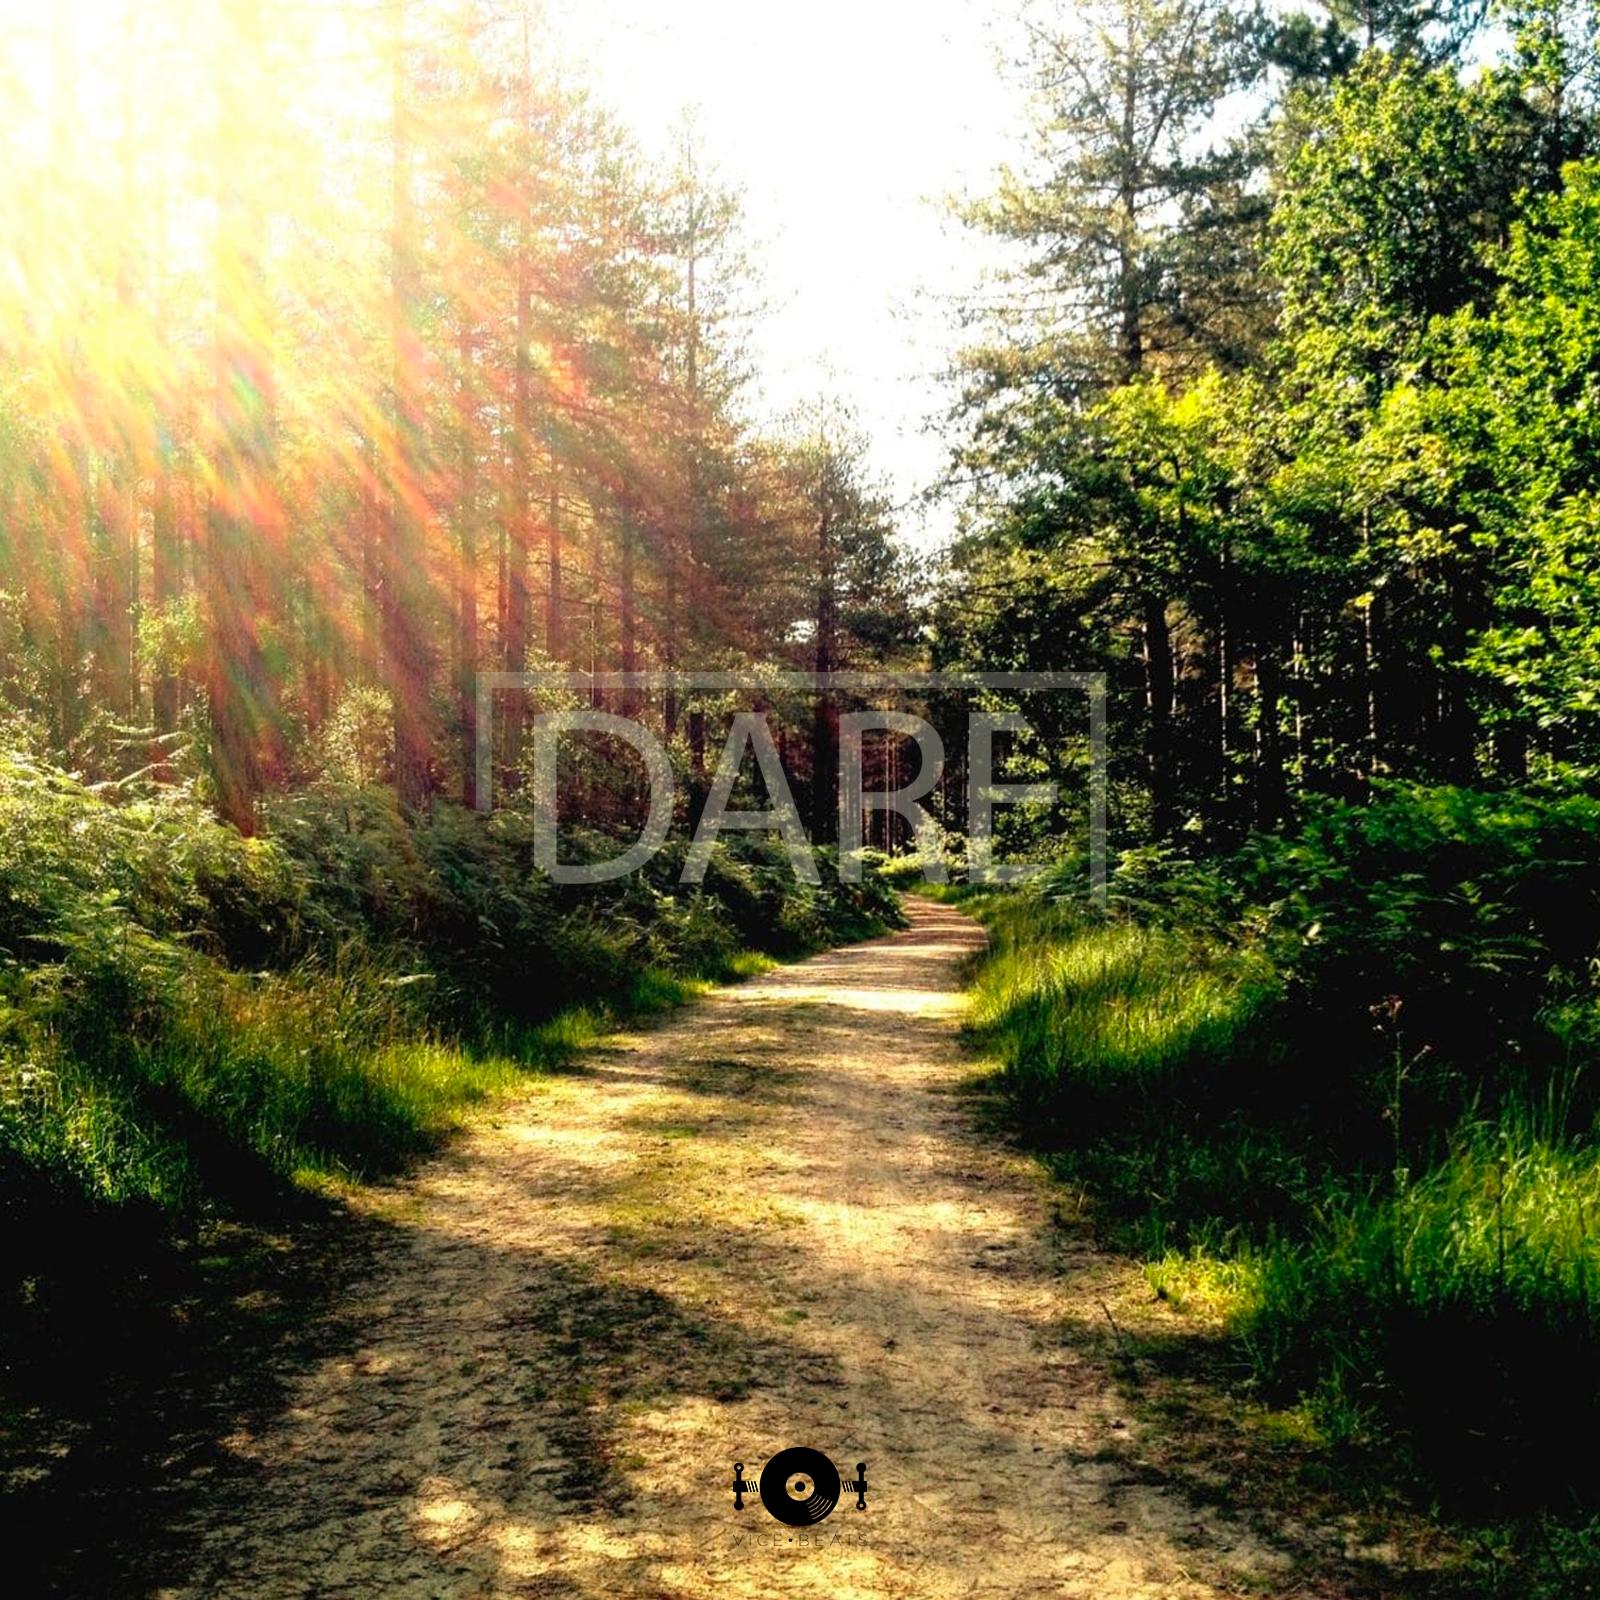 Vice beats - Dare